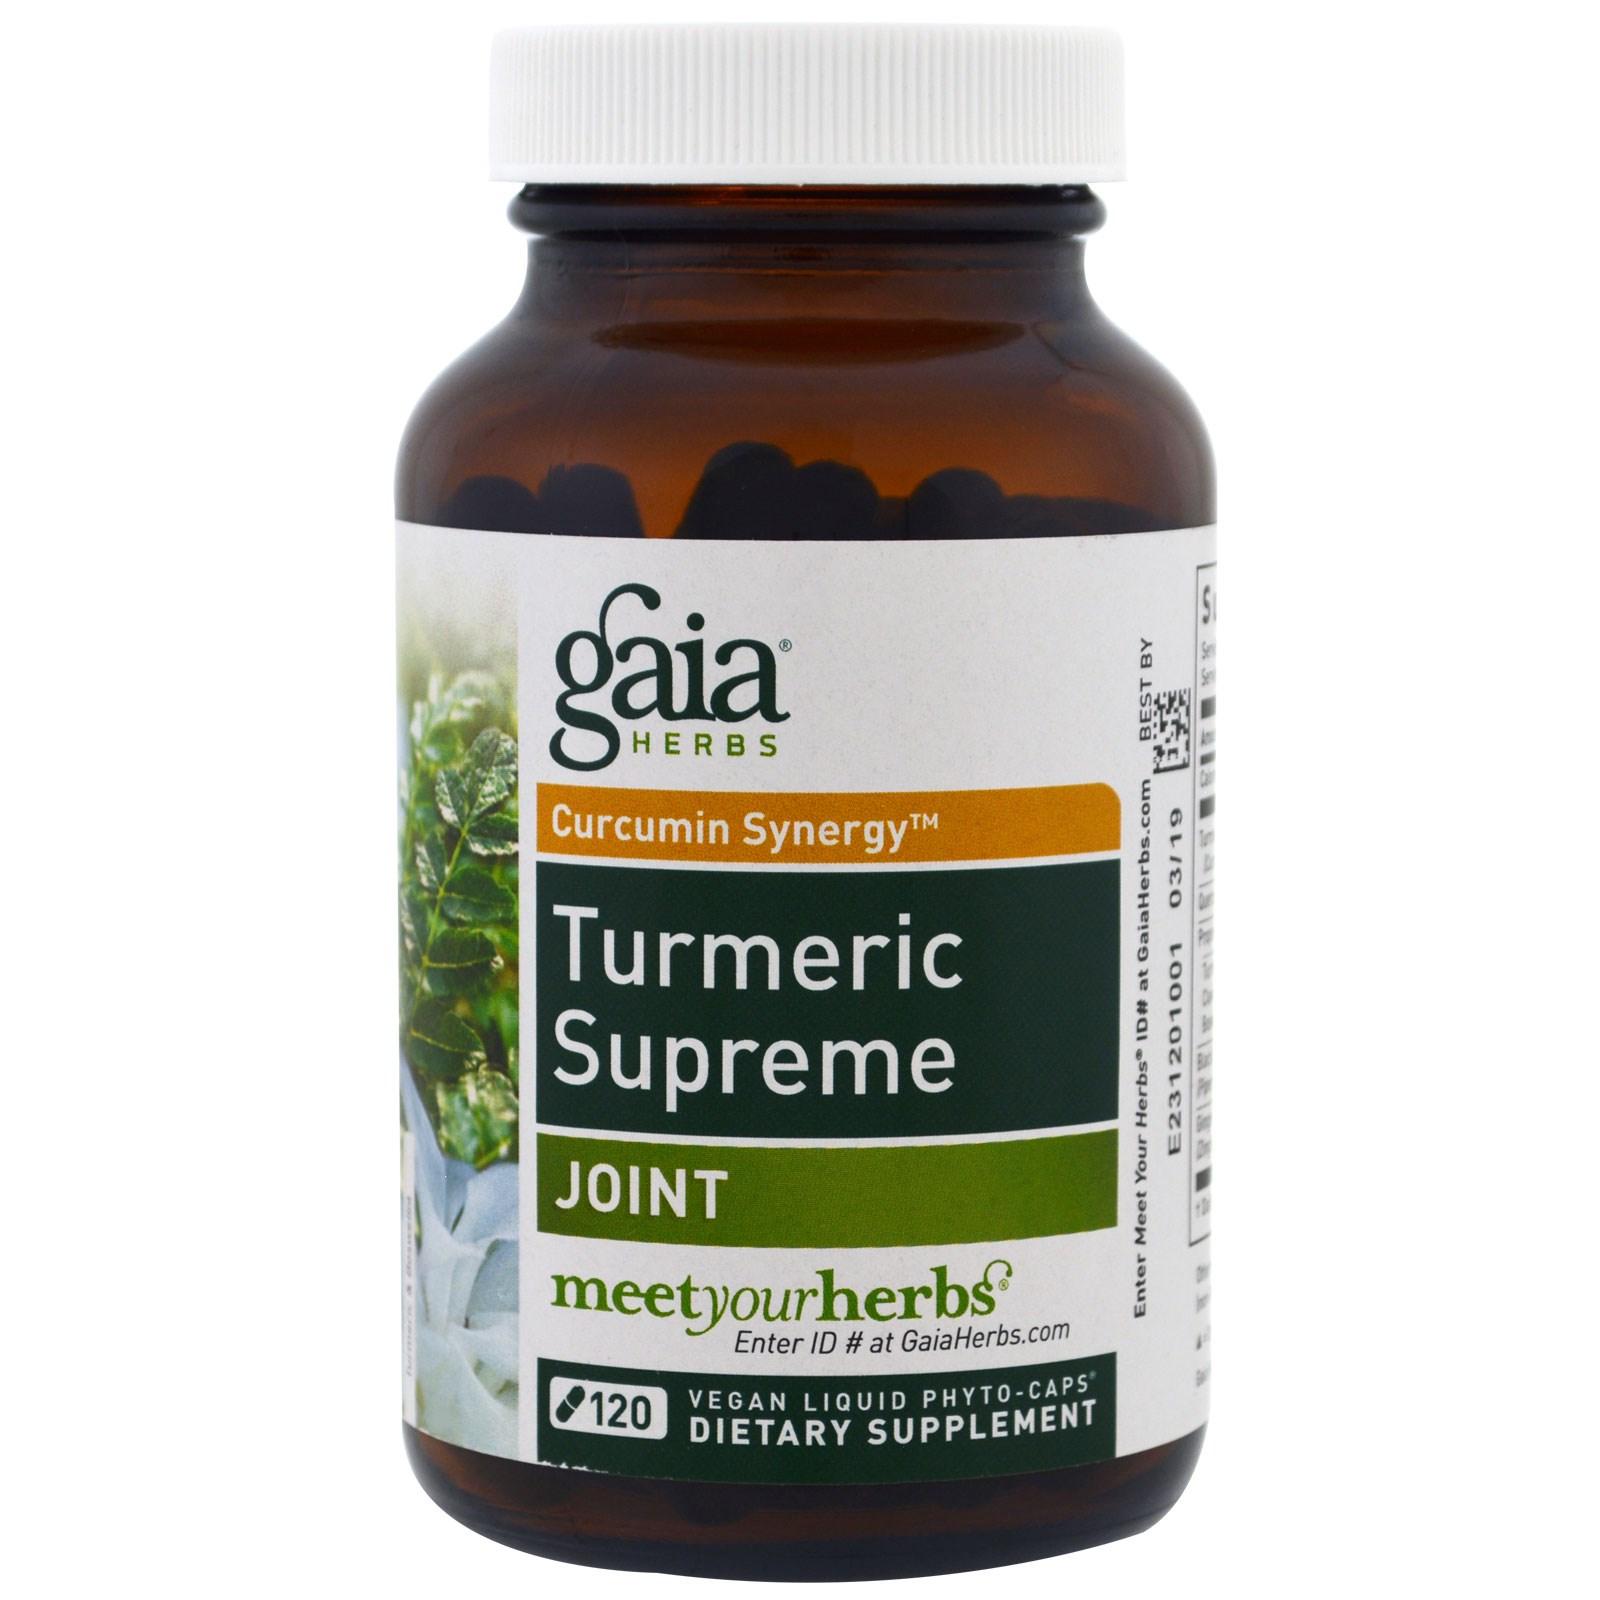 Gaia Herbs, Turmeric Supreme, суставы, 120 вегетерианских жидких фитокапсул